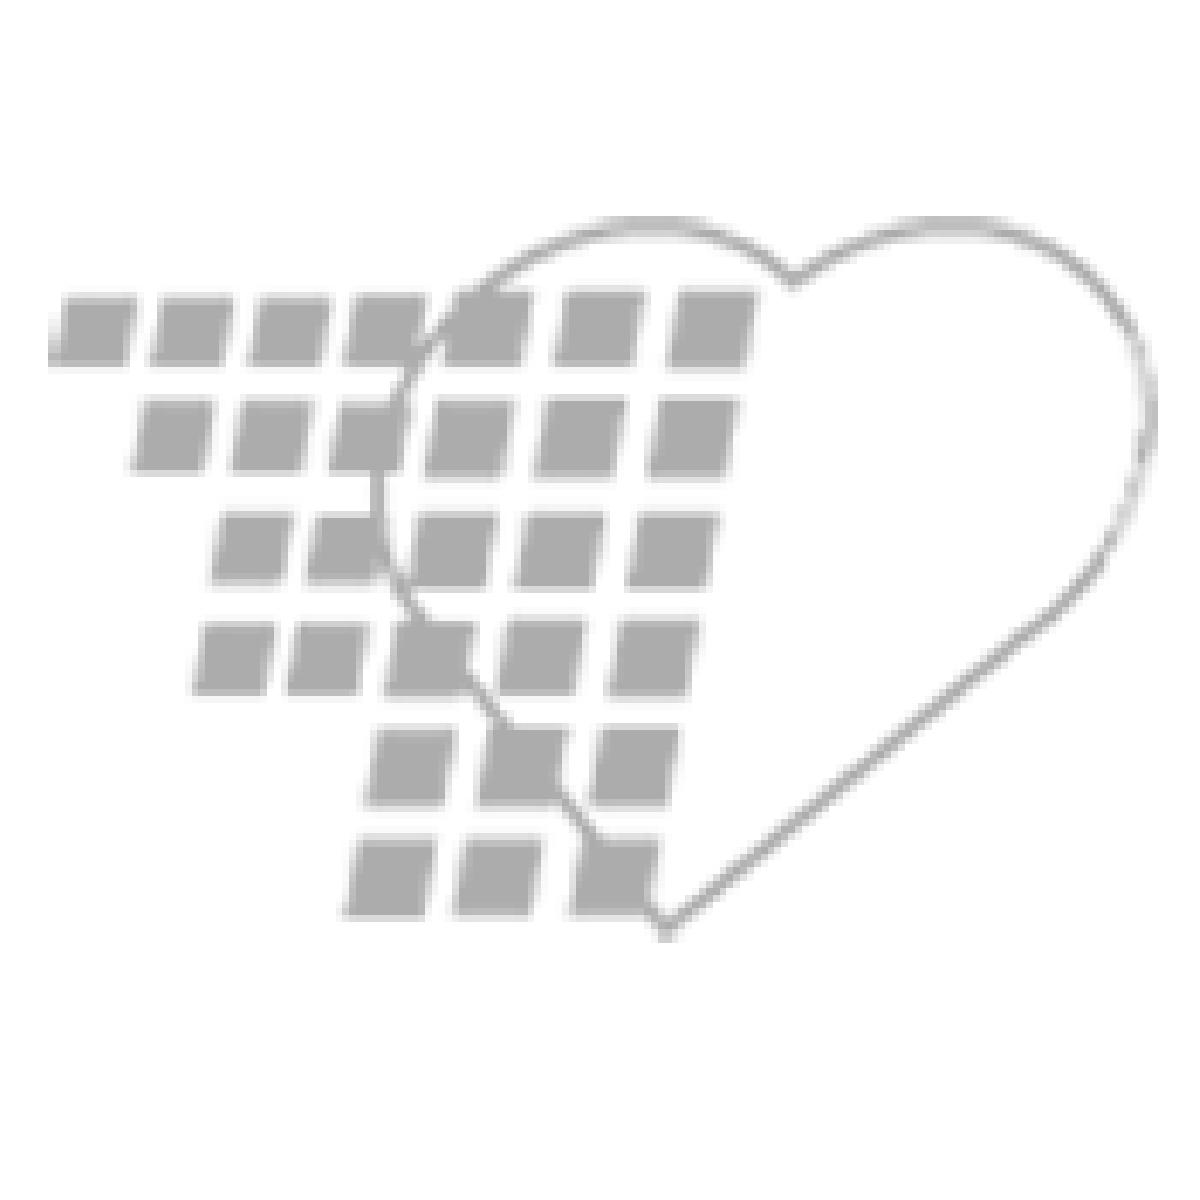 06-93-1030-1000ML - Demo Dose® Lactatd Ringr'  s IV Fluid 1000 mL